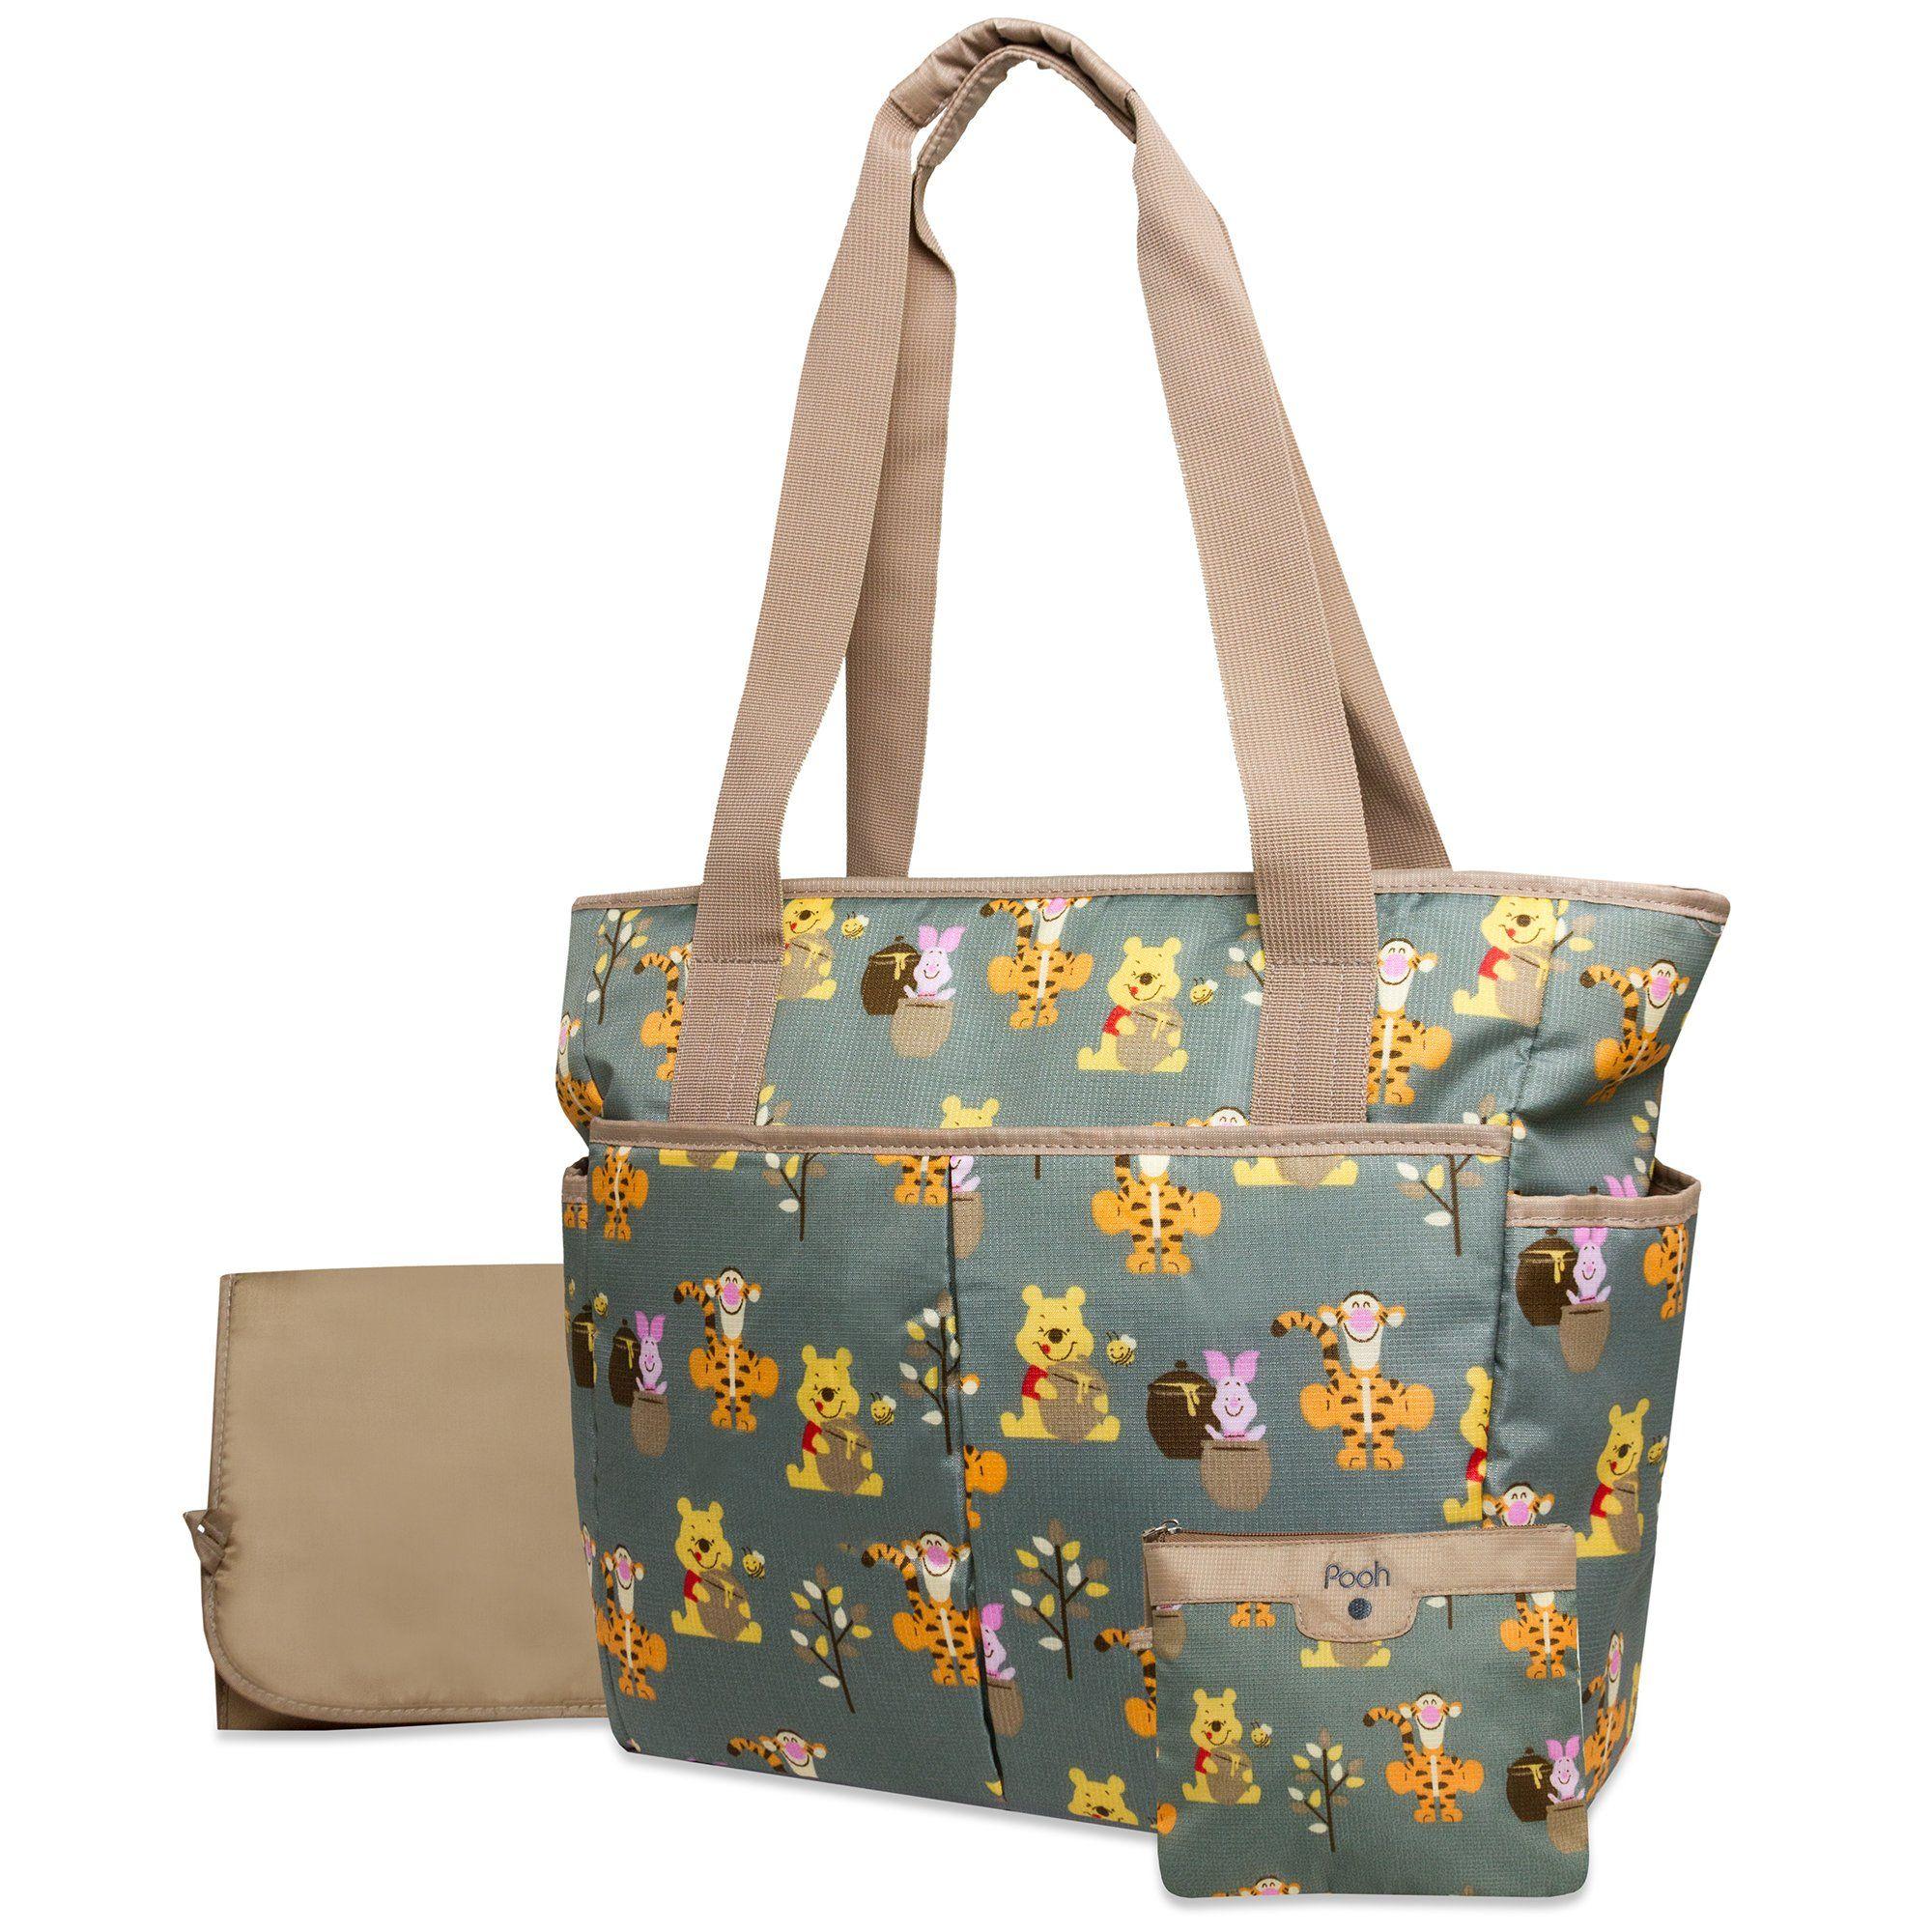 Winnie-the-Pooh Diaper Bag   All Fashion Bags  Winnie The Pooh Baby Bag